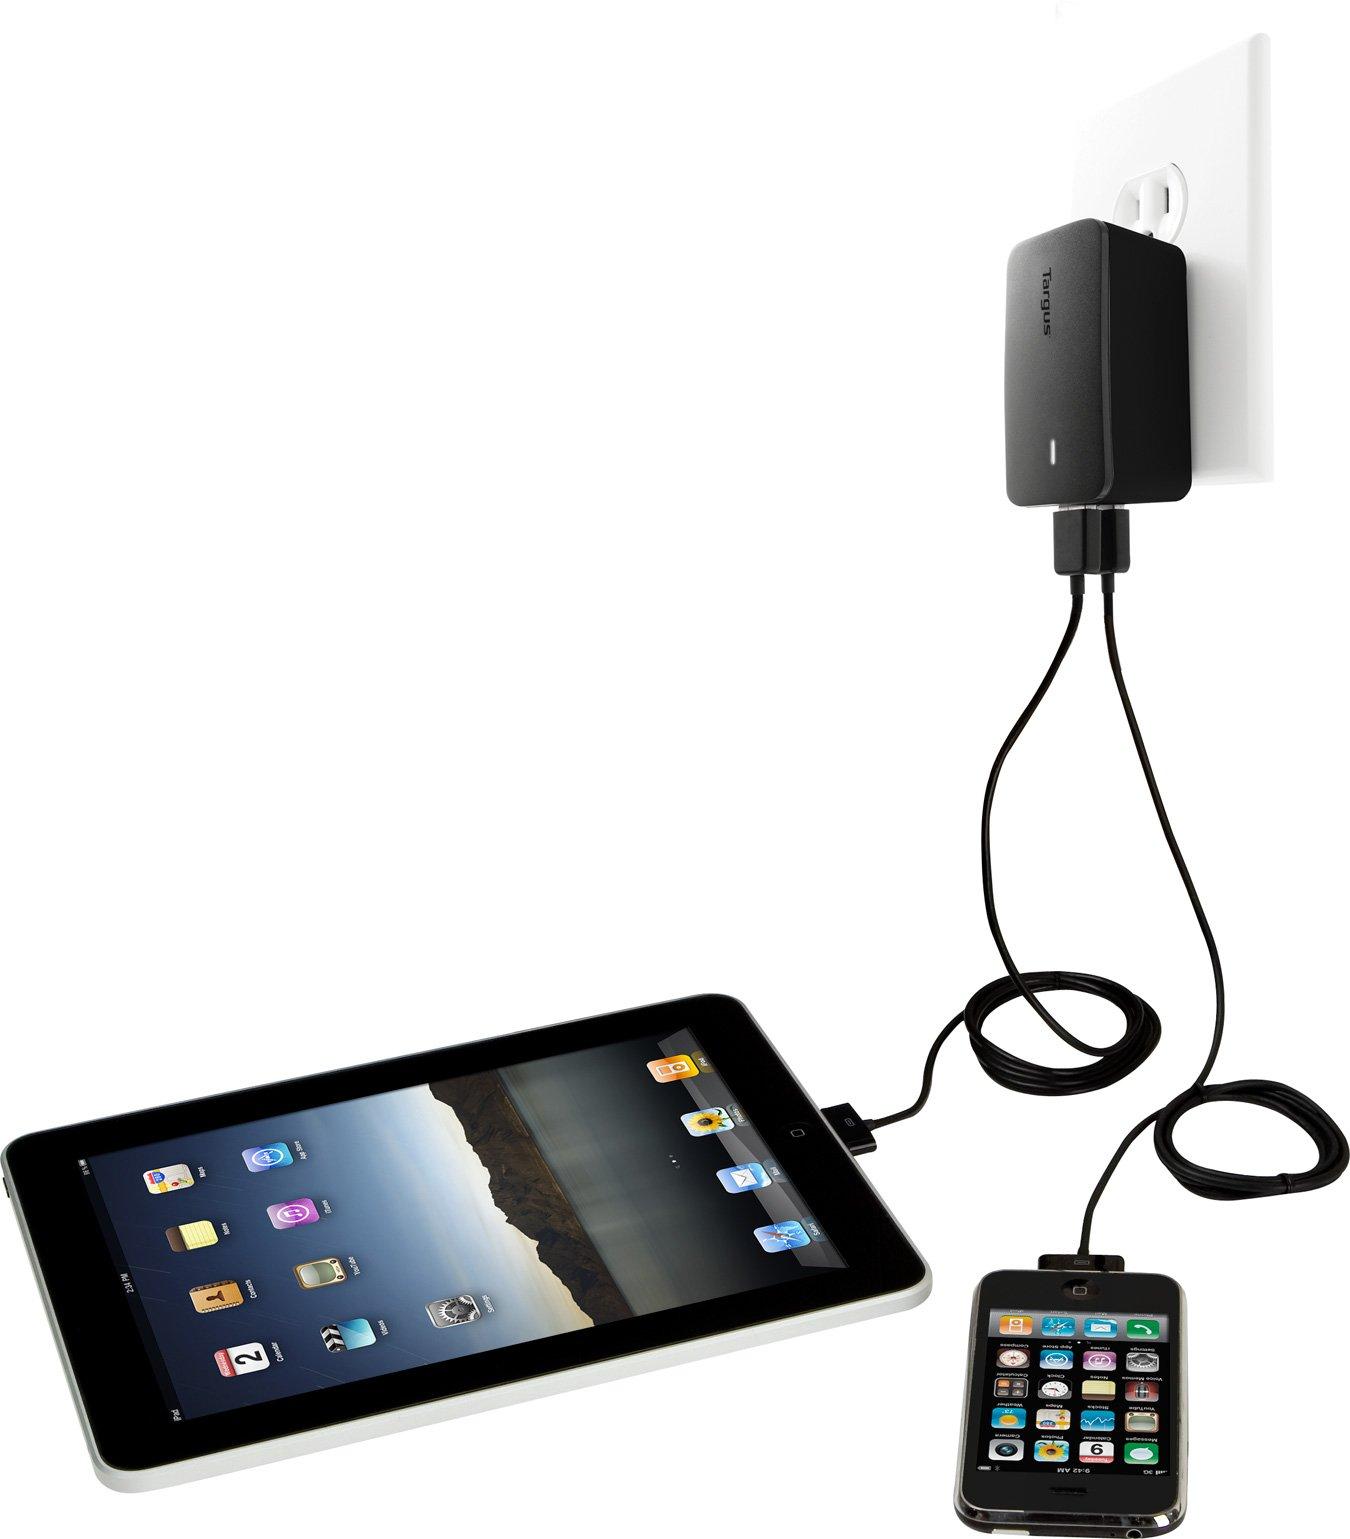 Targus Dual Charger for Apple iPad, iPad 2, new iPad (3rd Generation), 16GB, 32GB, 64GB WiFi + 4G, iPhone and iPod APA15US (Black)